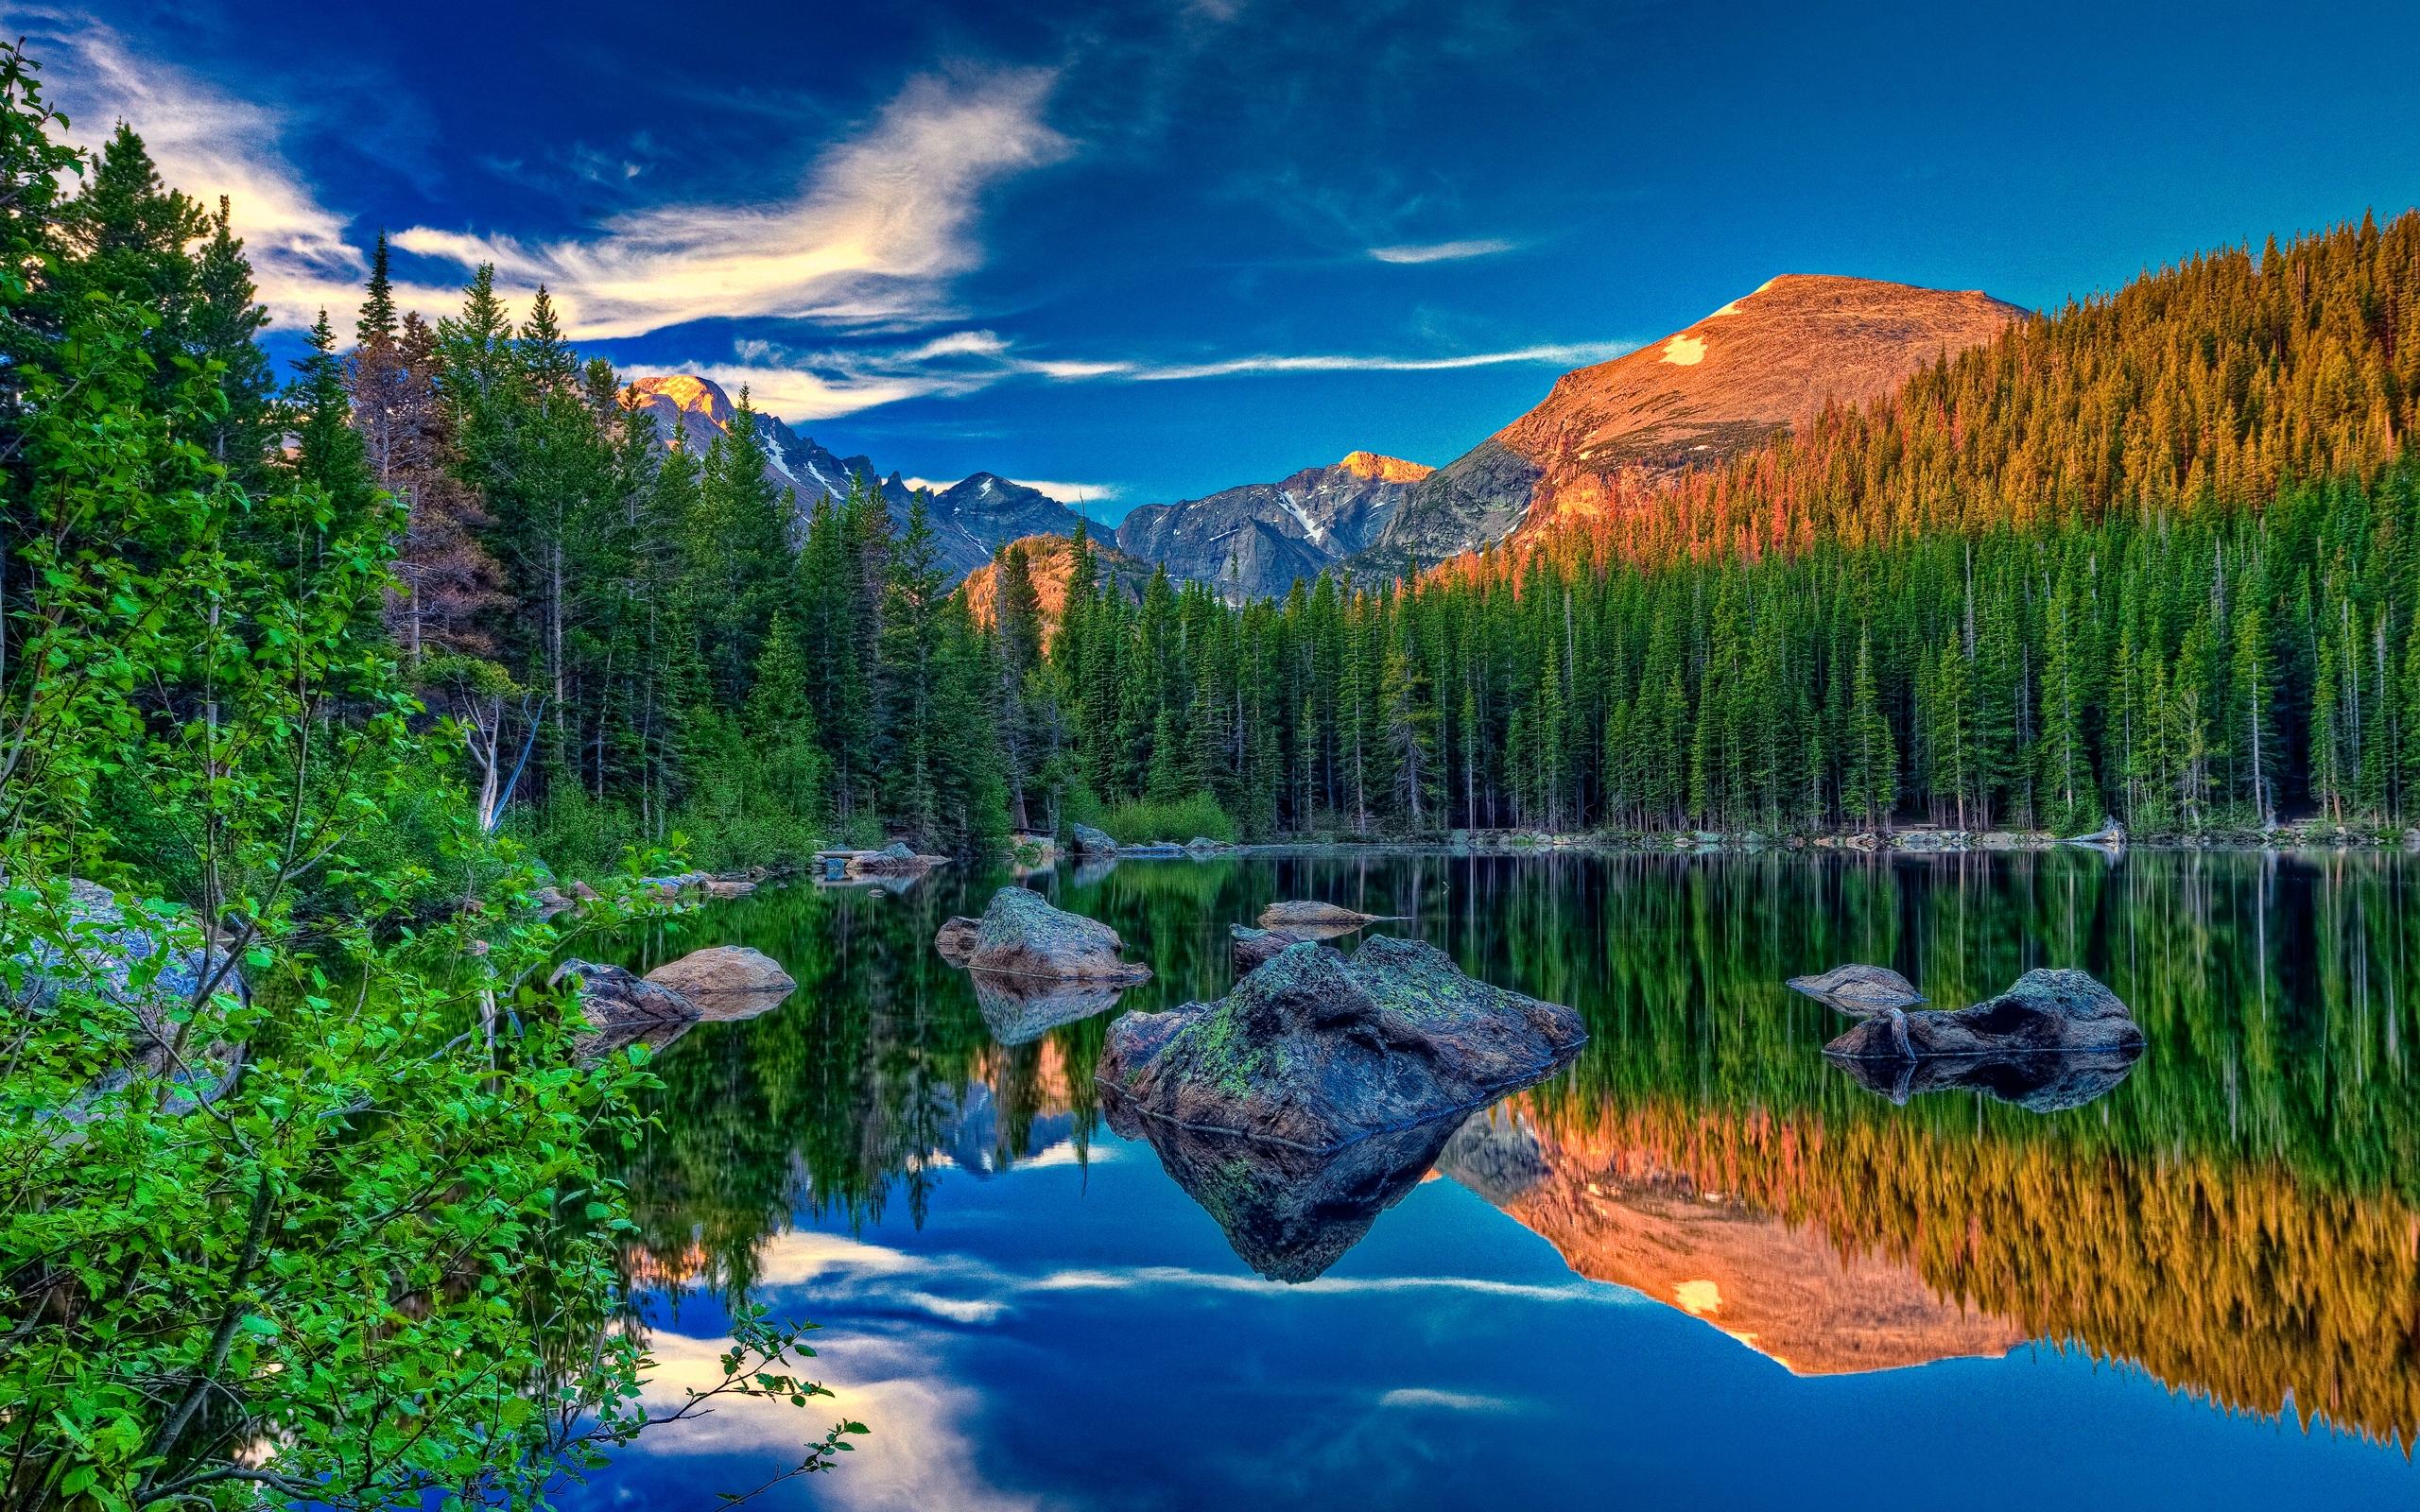 World Most Beautiful Places Wallpapers - WallpaperSafari